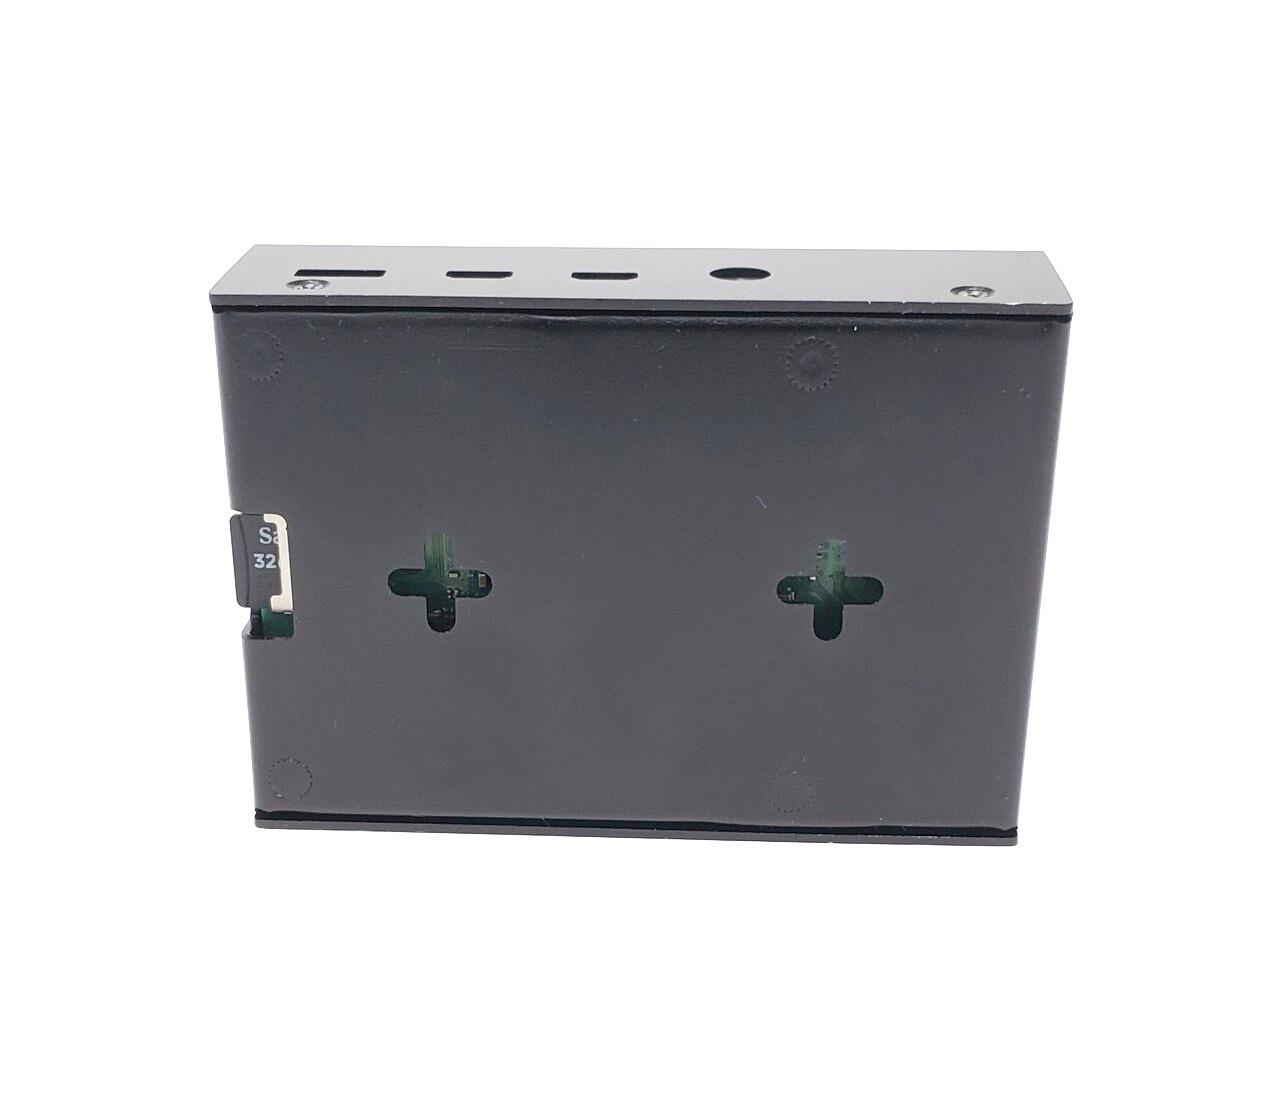 Aluminum Raspberry Pi 4 Model B Case with Fan